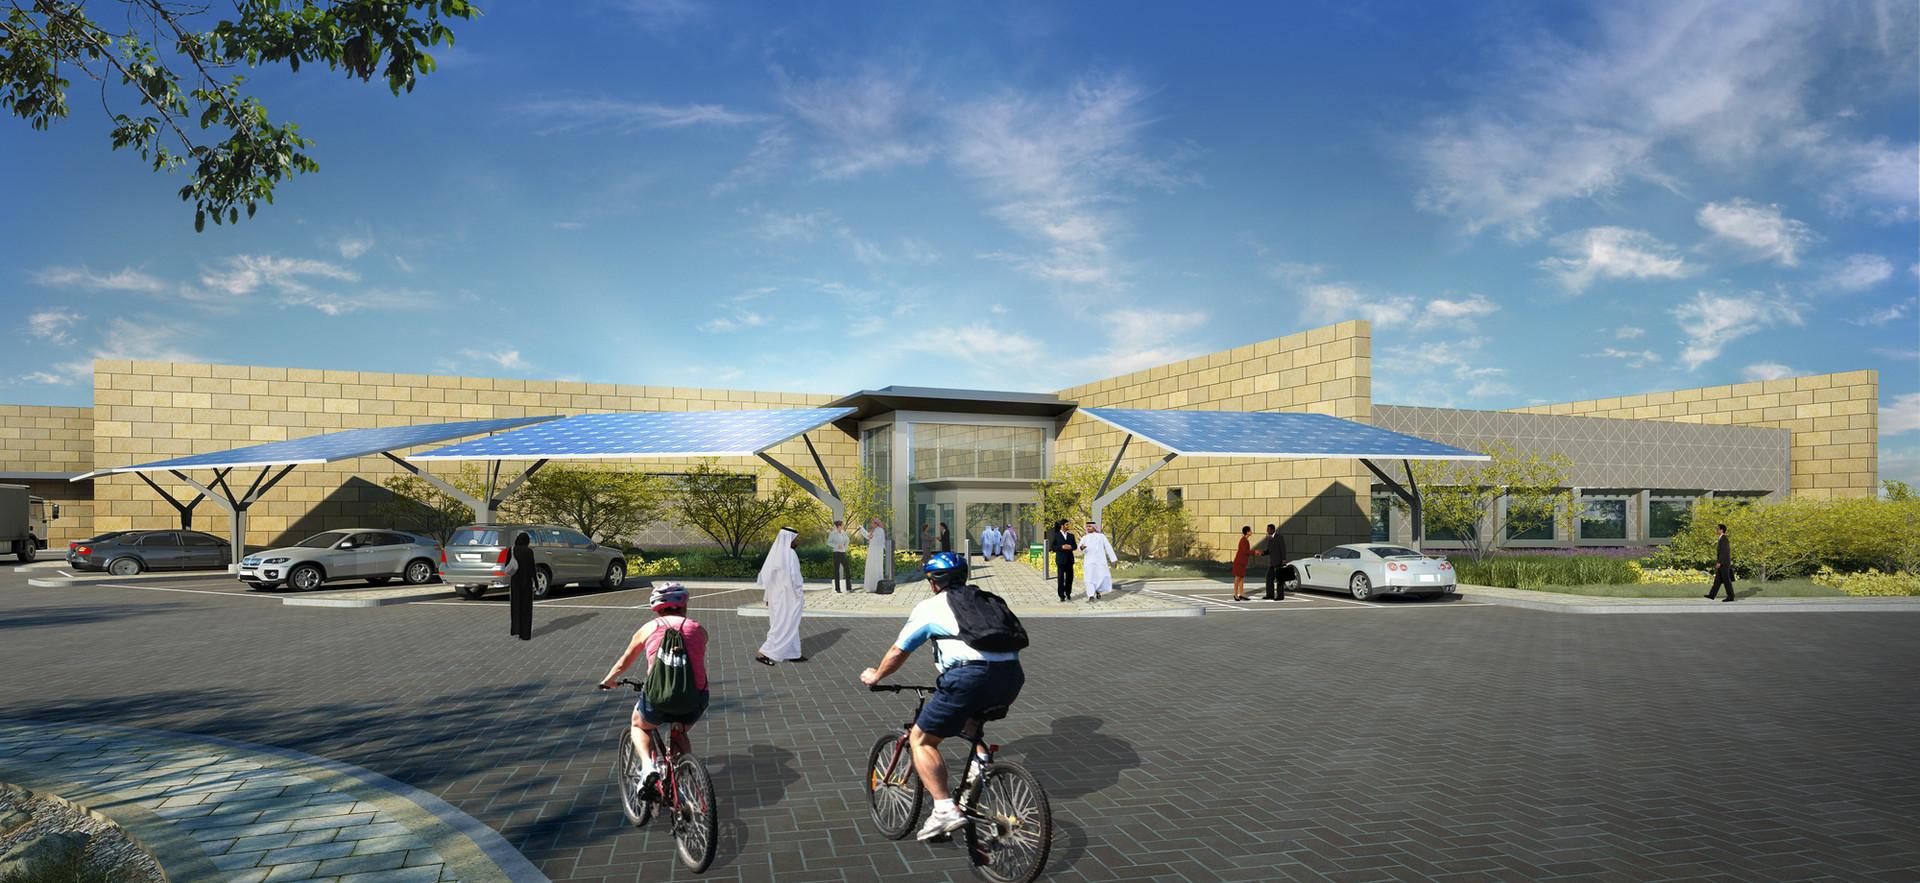 QSTP Solar Test Facility, Qatar